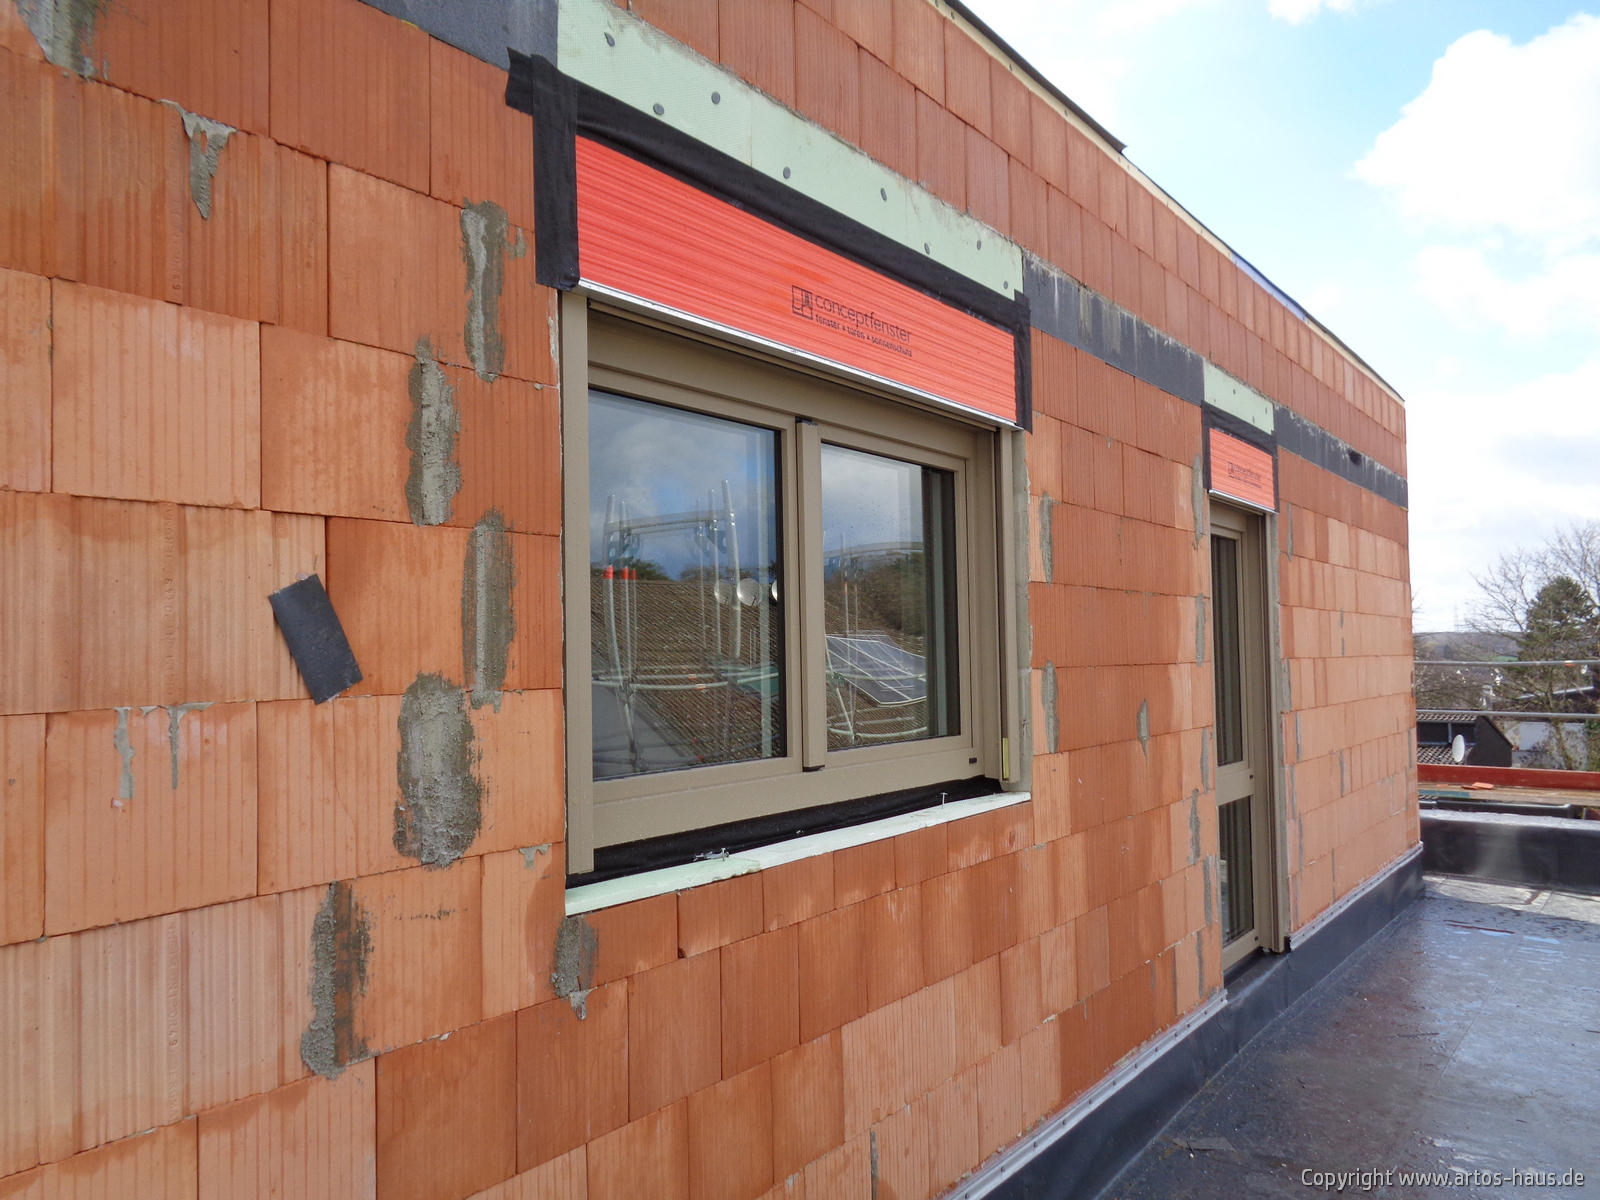 Fenstereinbau ARTOS HAUS 2021, Bild 3